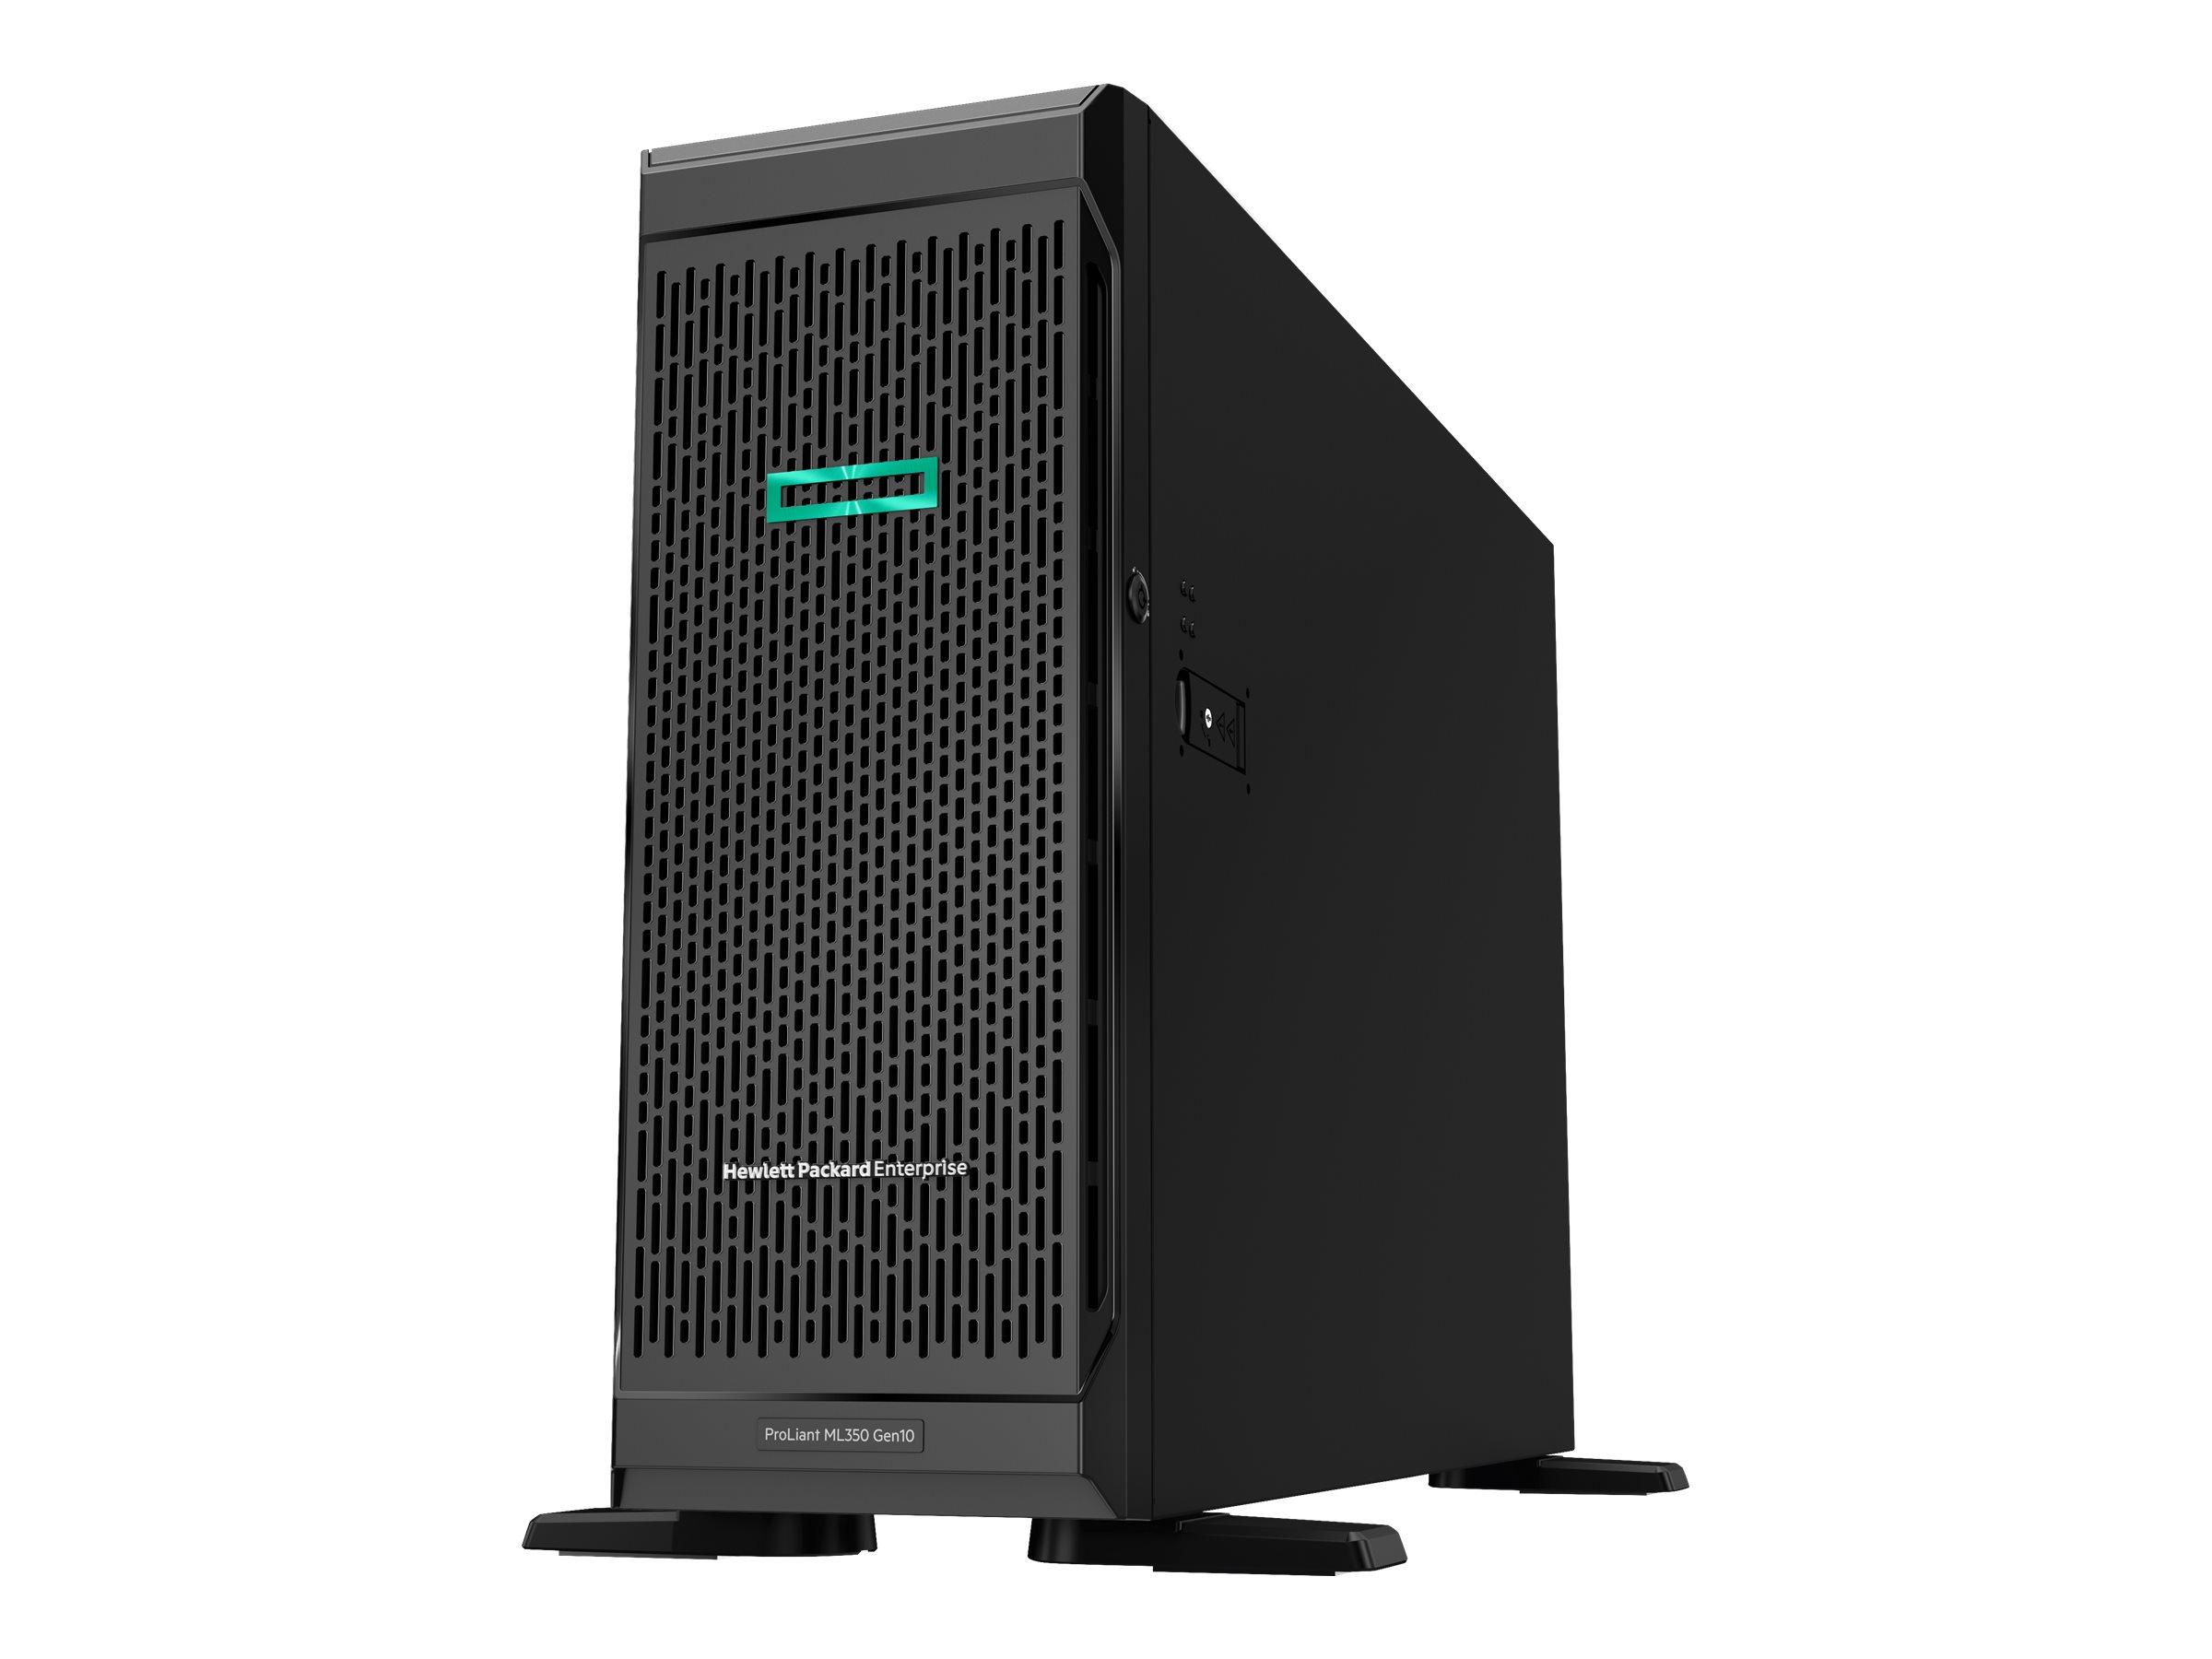 HPE ProLiant ML350 Gen10 Sub-Entry - Server - Tower - 4U - zweiweg - 1 x Xeon Bronze 3104 / 1.7 GHz